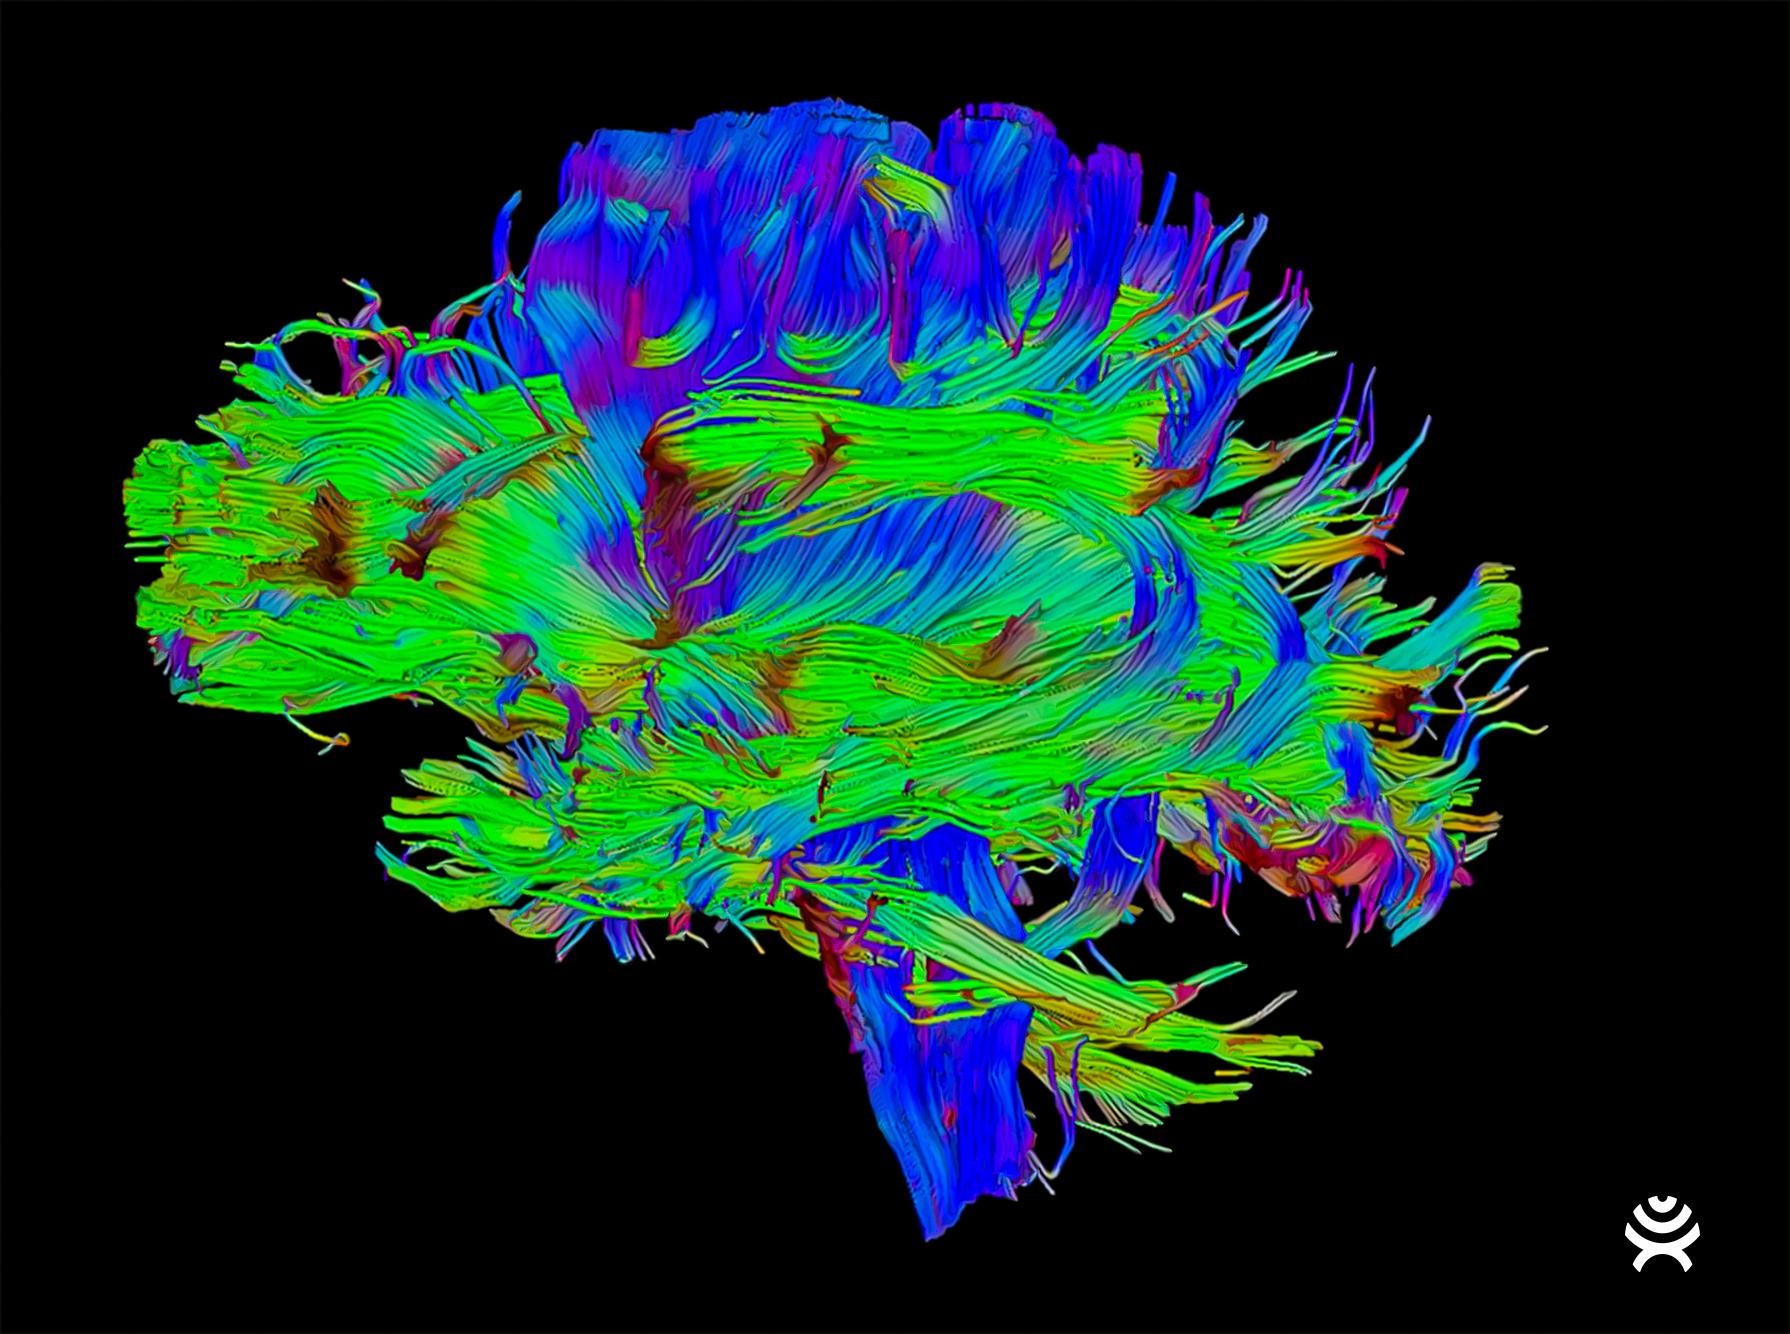 Synaptive Medical's BrightMatter technology